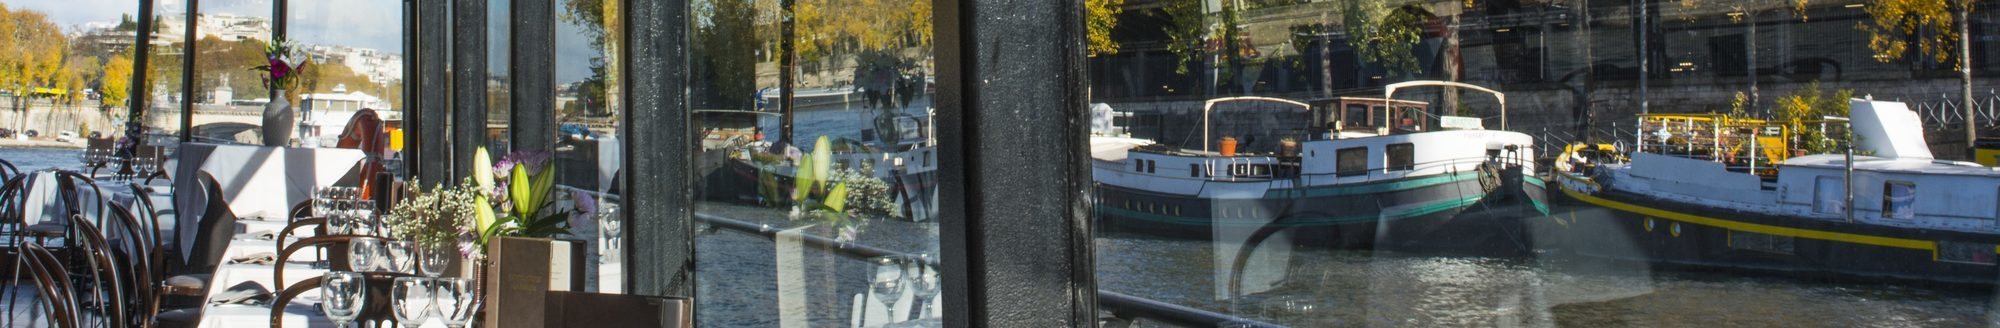 Marina de Paris Déjeuner-Croisière